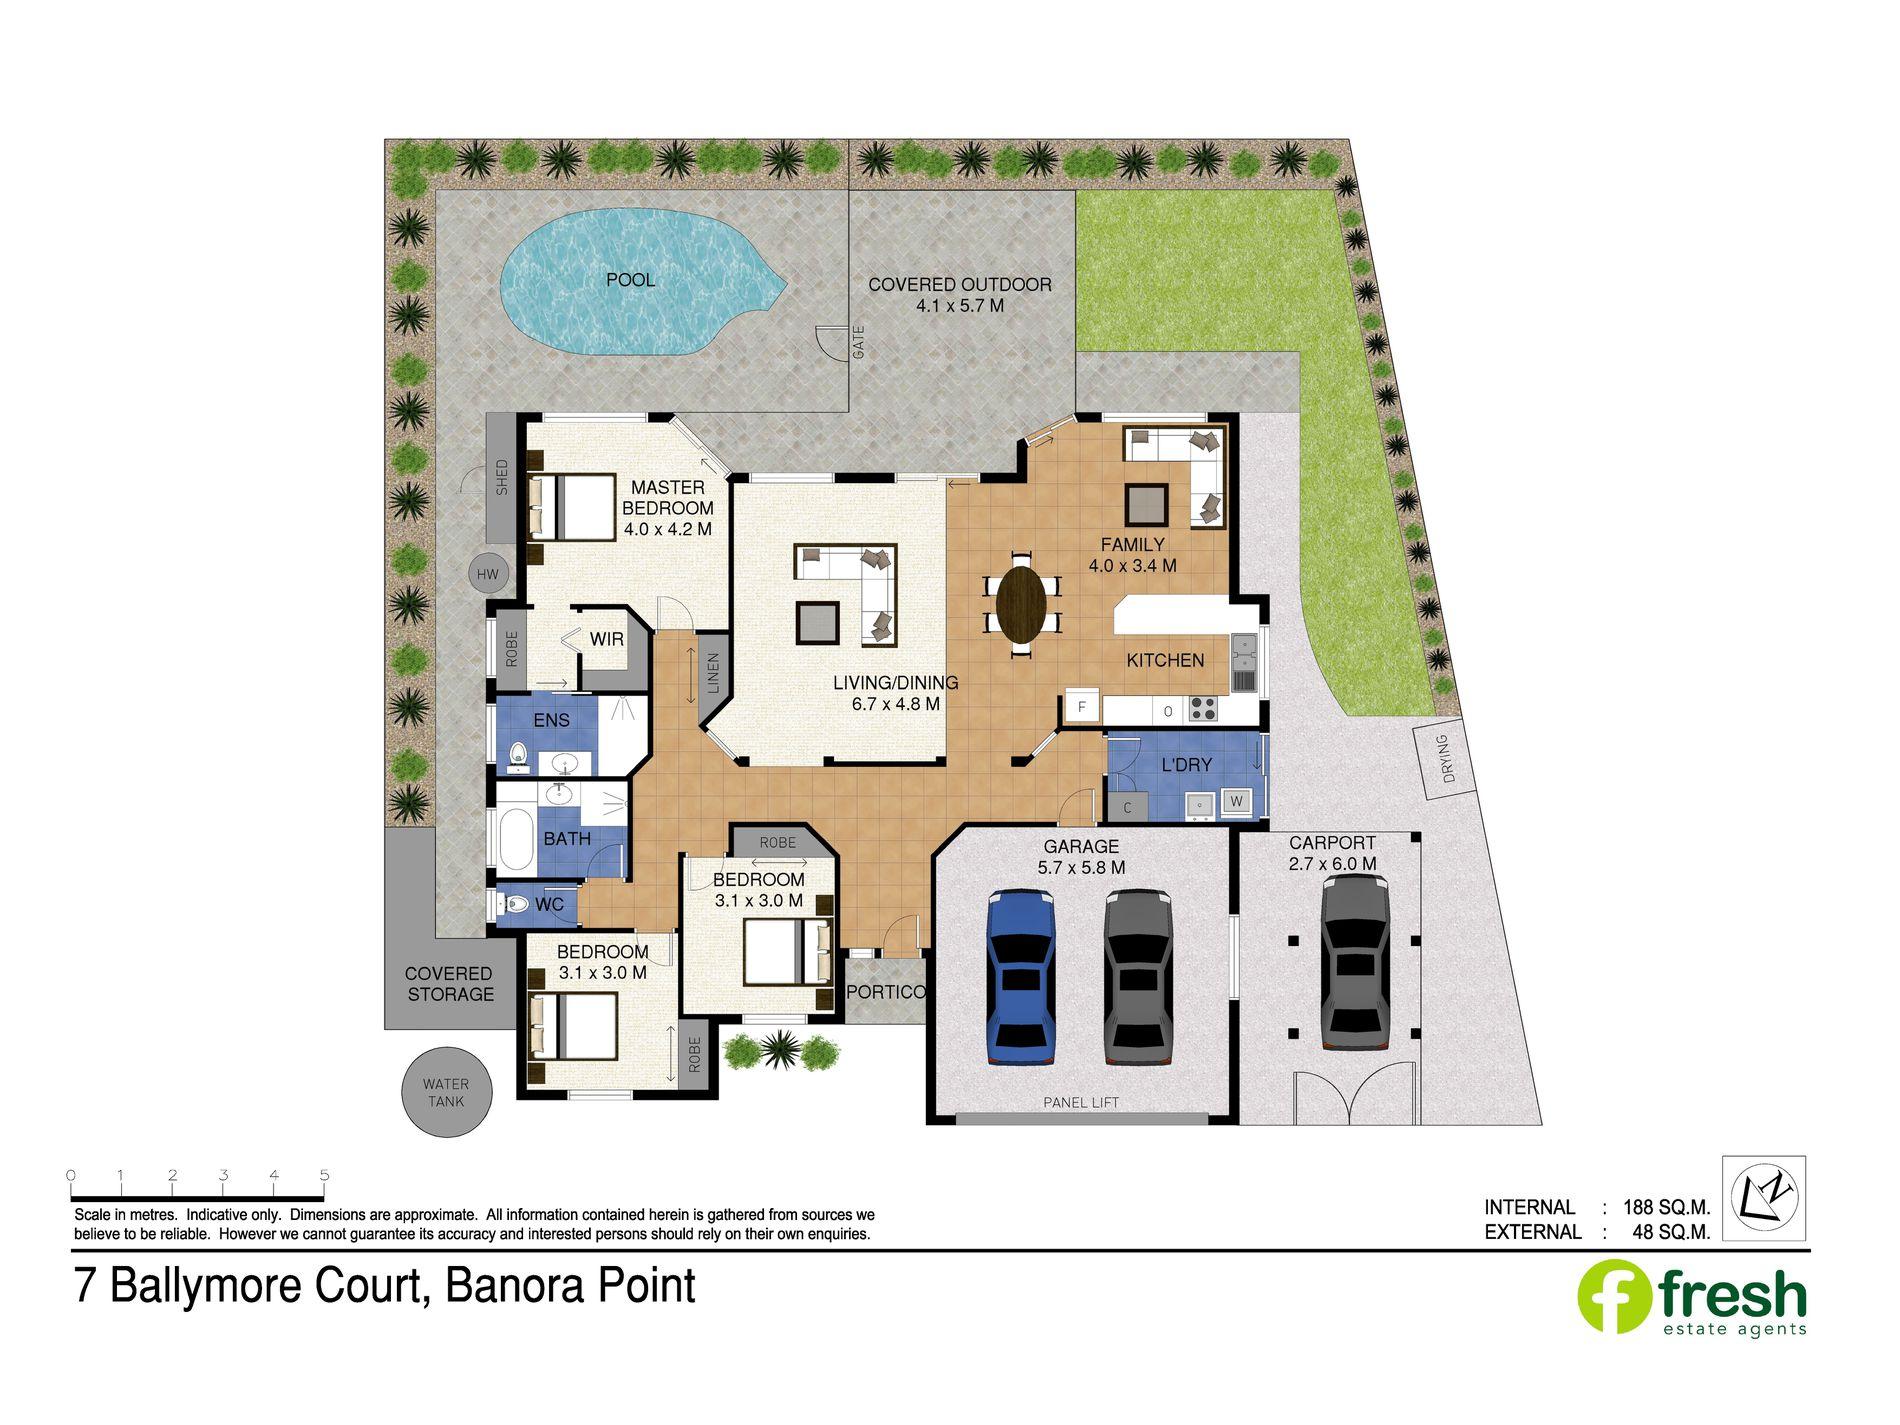 7 Ballymore Court, Banora Point